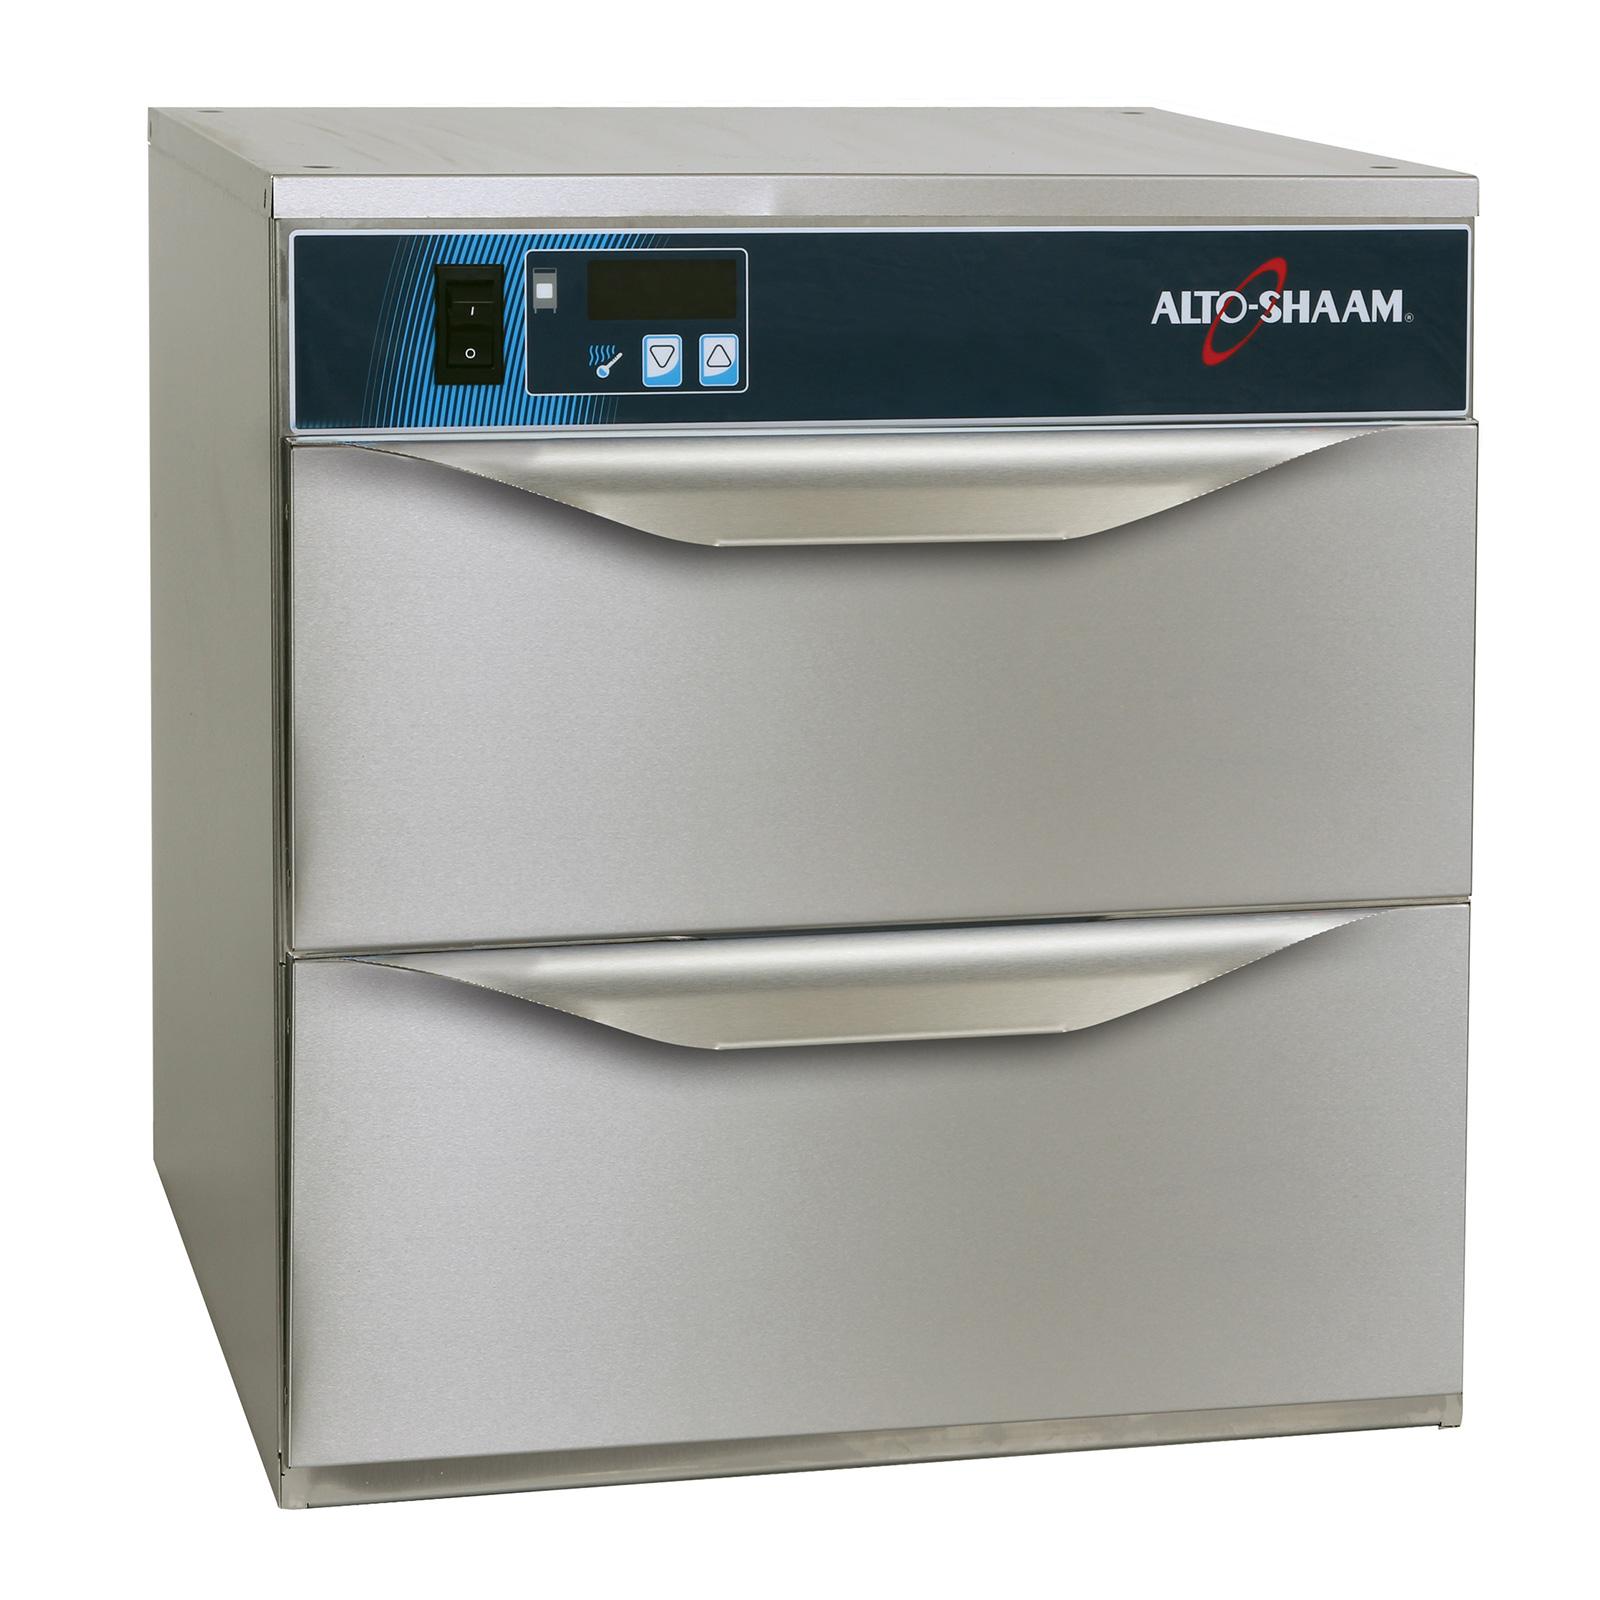 Alto-Shaam 500-2DN-QS warming drawer, free standing